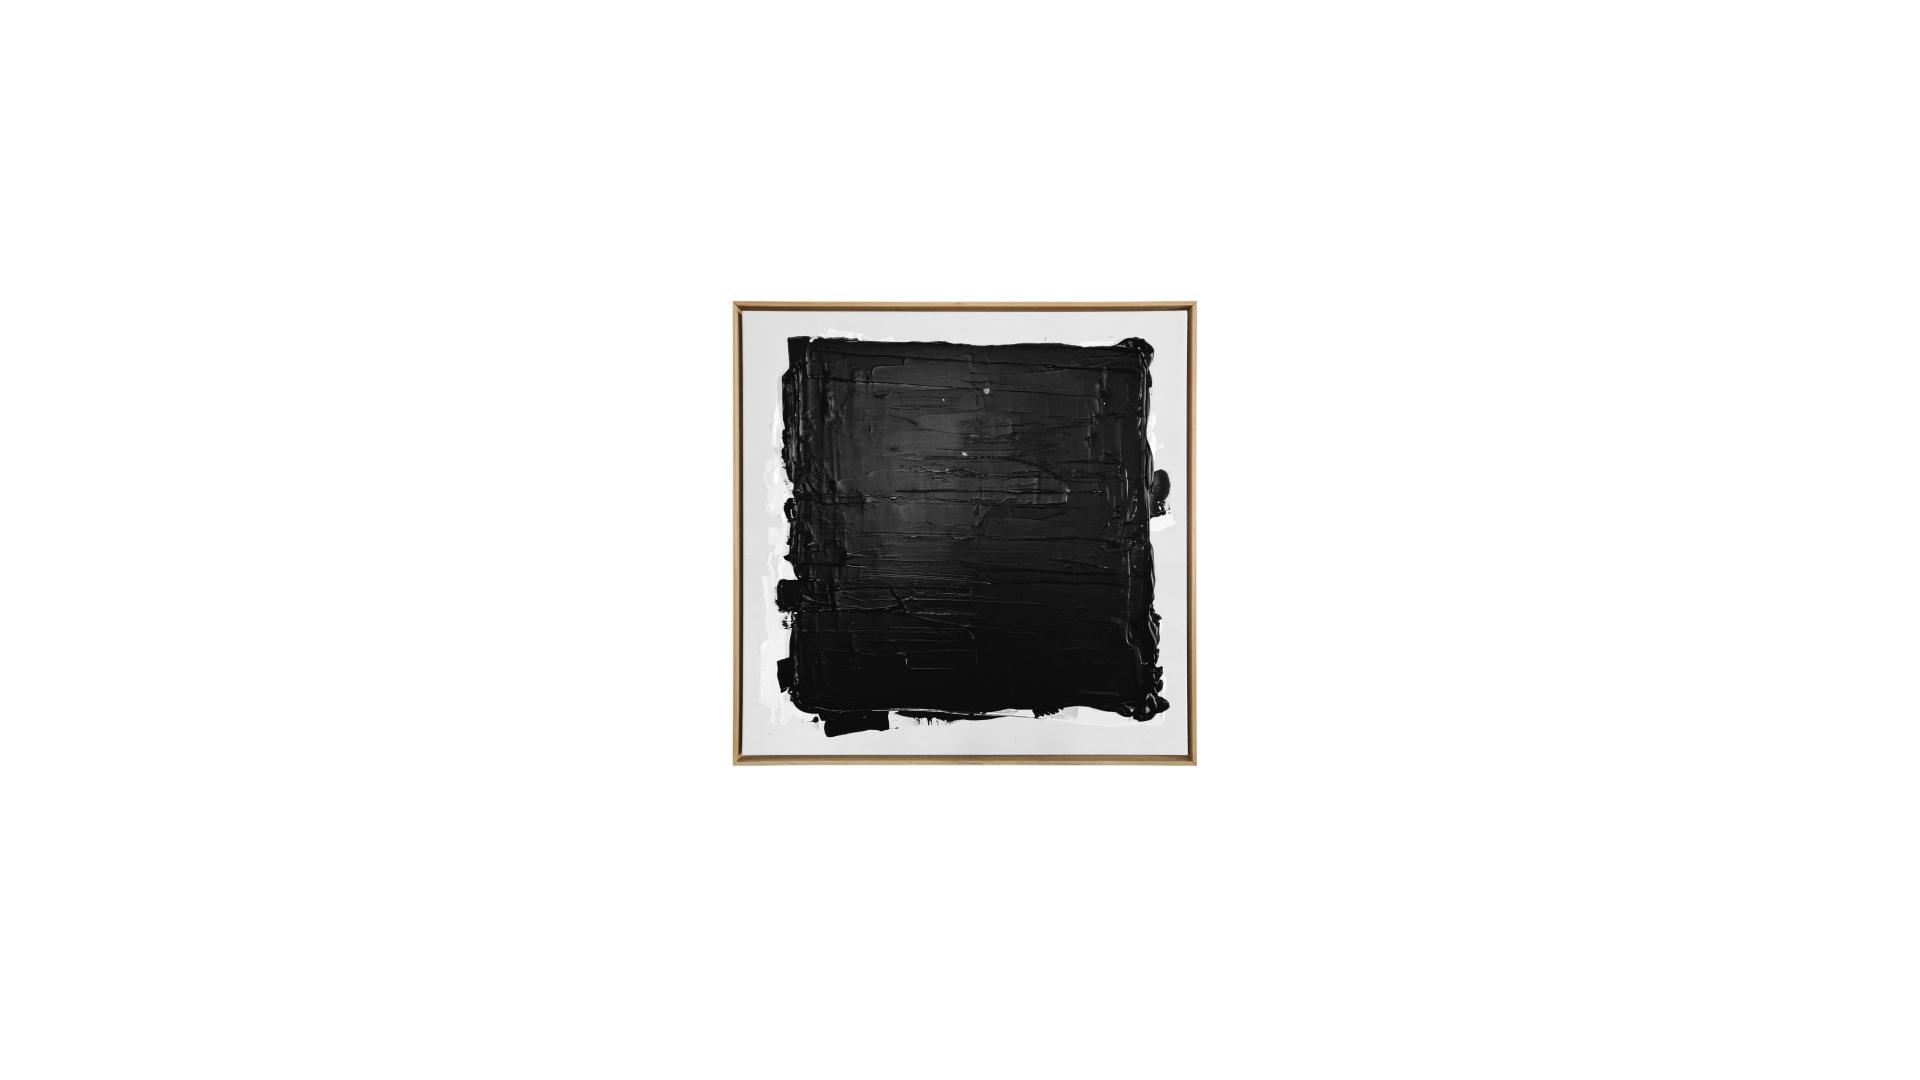 10-ENCONTREMONOS-AARON-NACHTAILER-ART-ARTIST